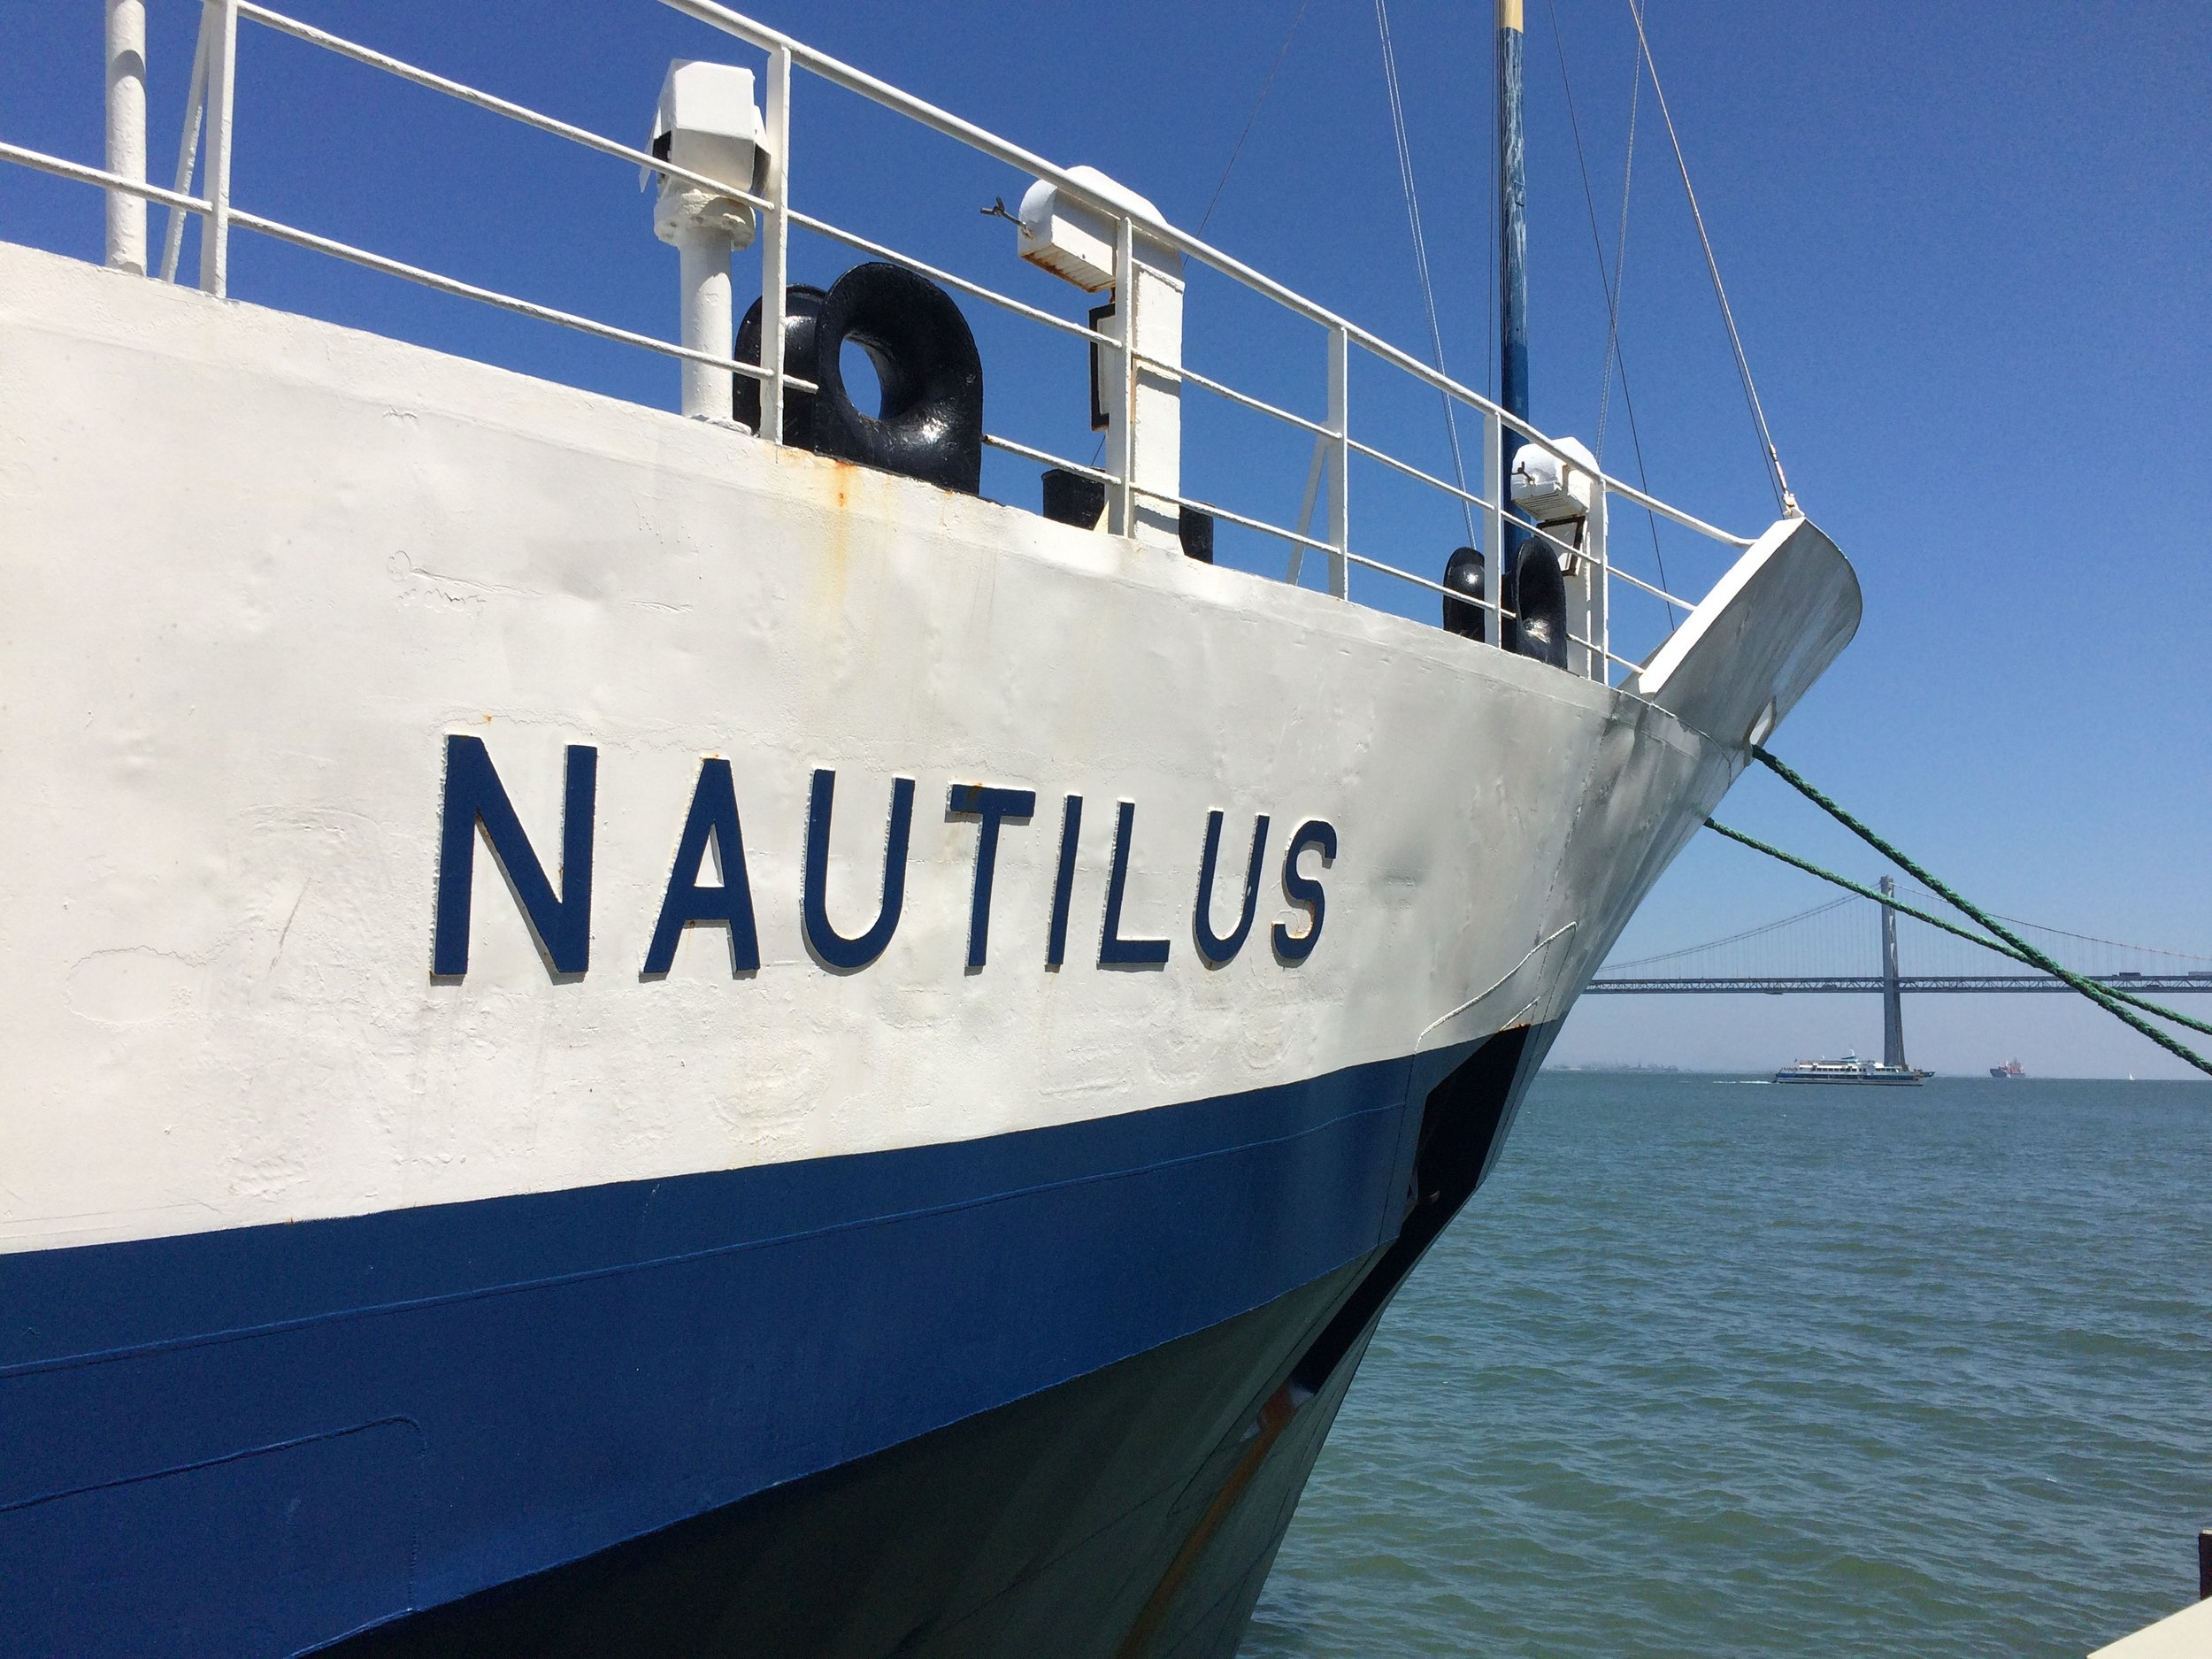 The lovely E/V Nautilus docked in San Francisco